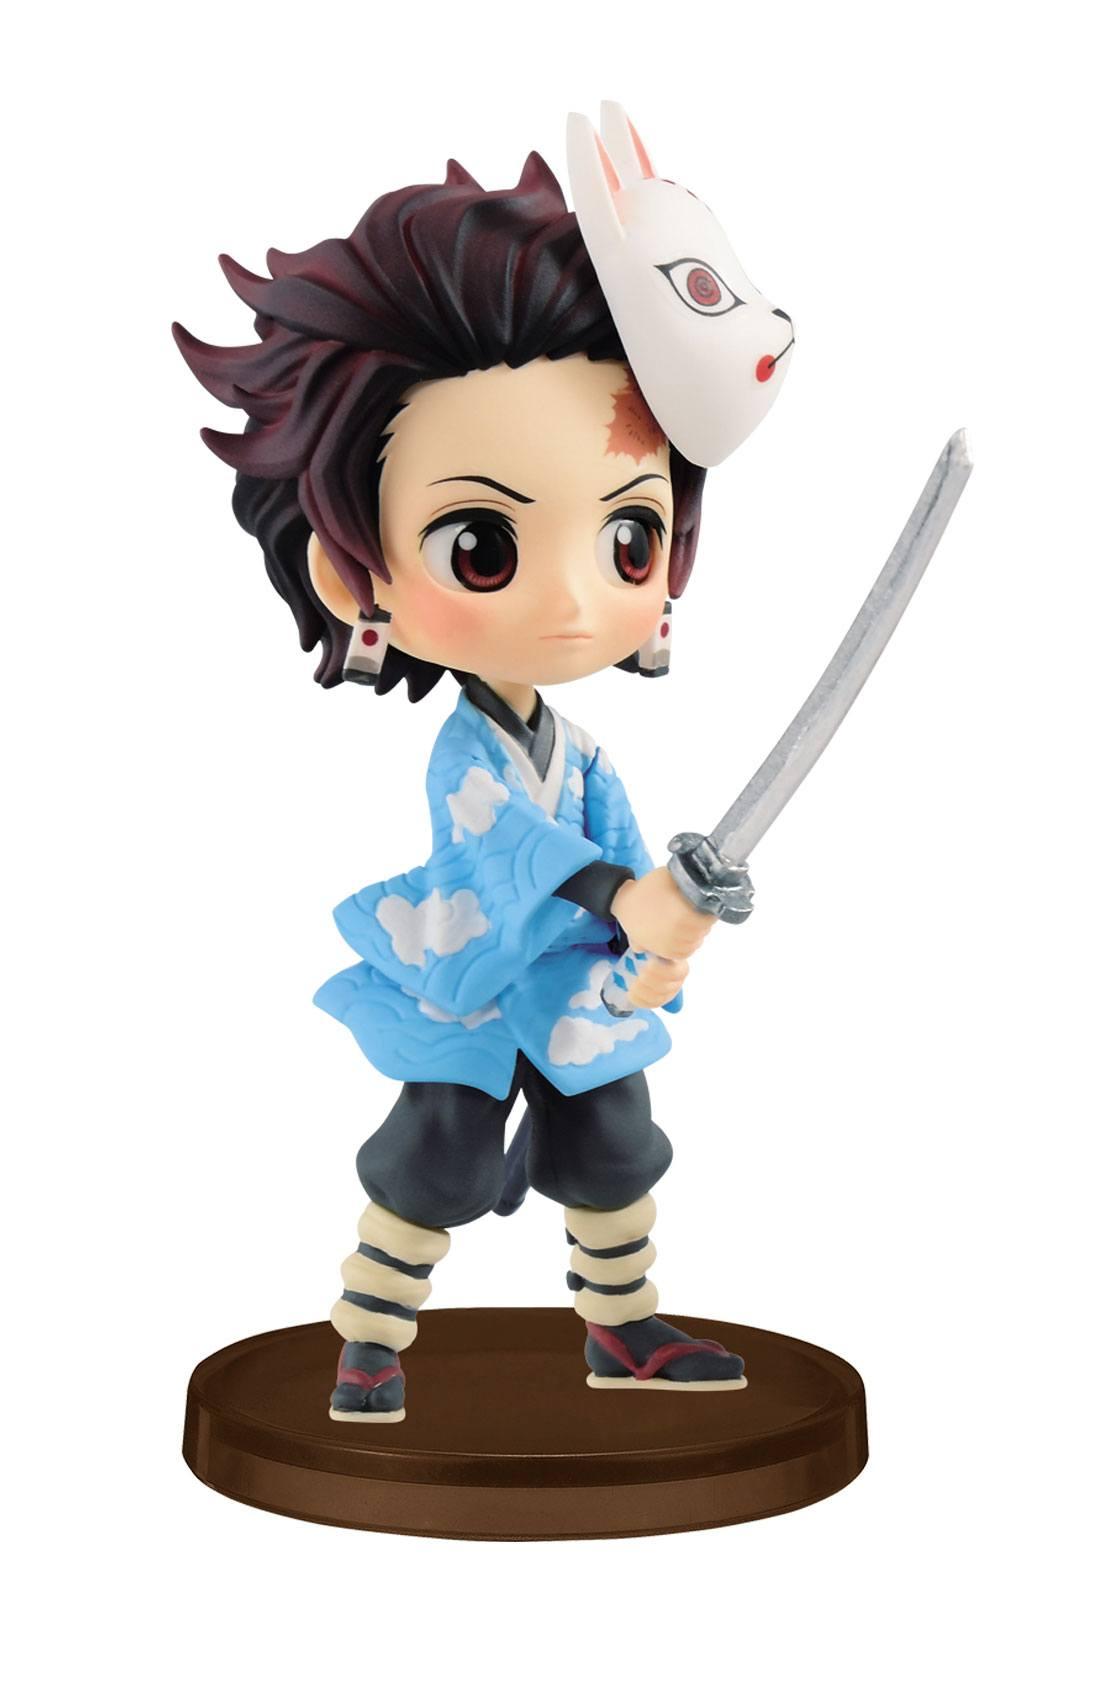 Demon Slayer Kimetsu no Yaiba Q Posket Petit Mini Figure Tanjiro Kamado 7 cm